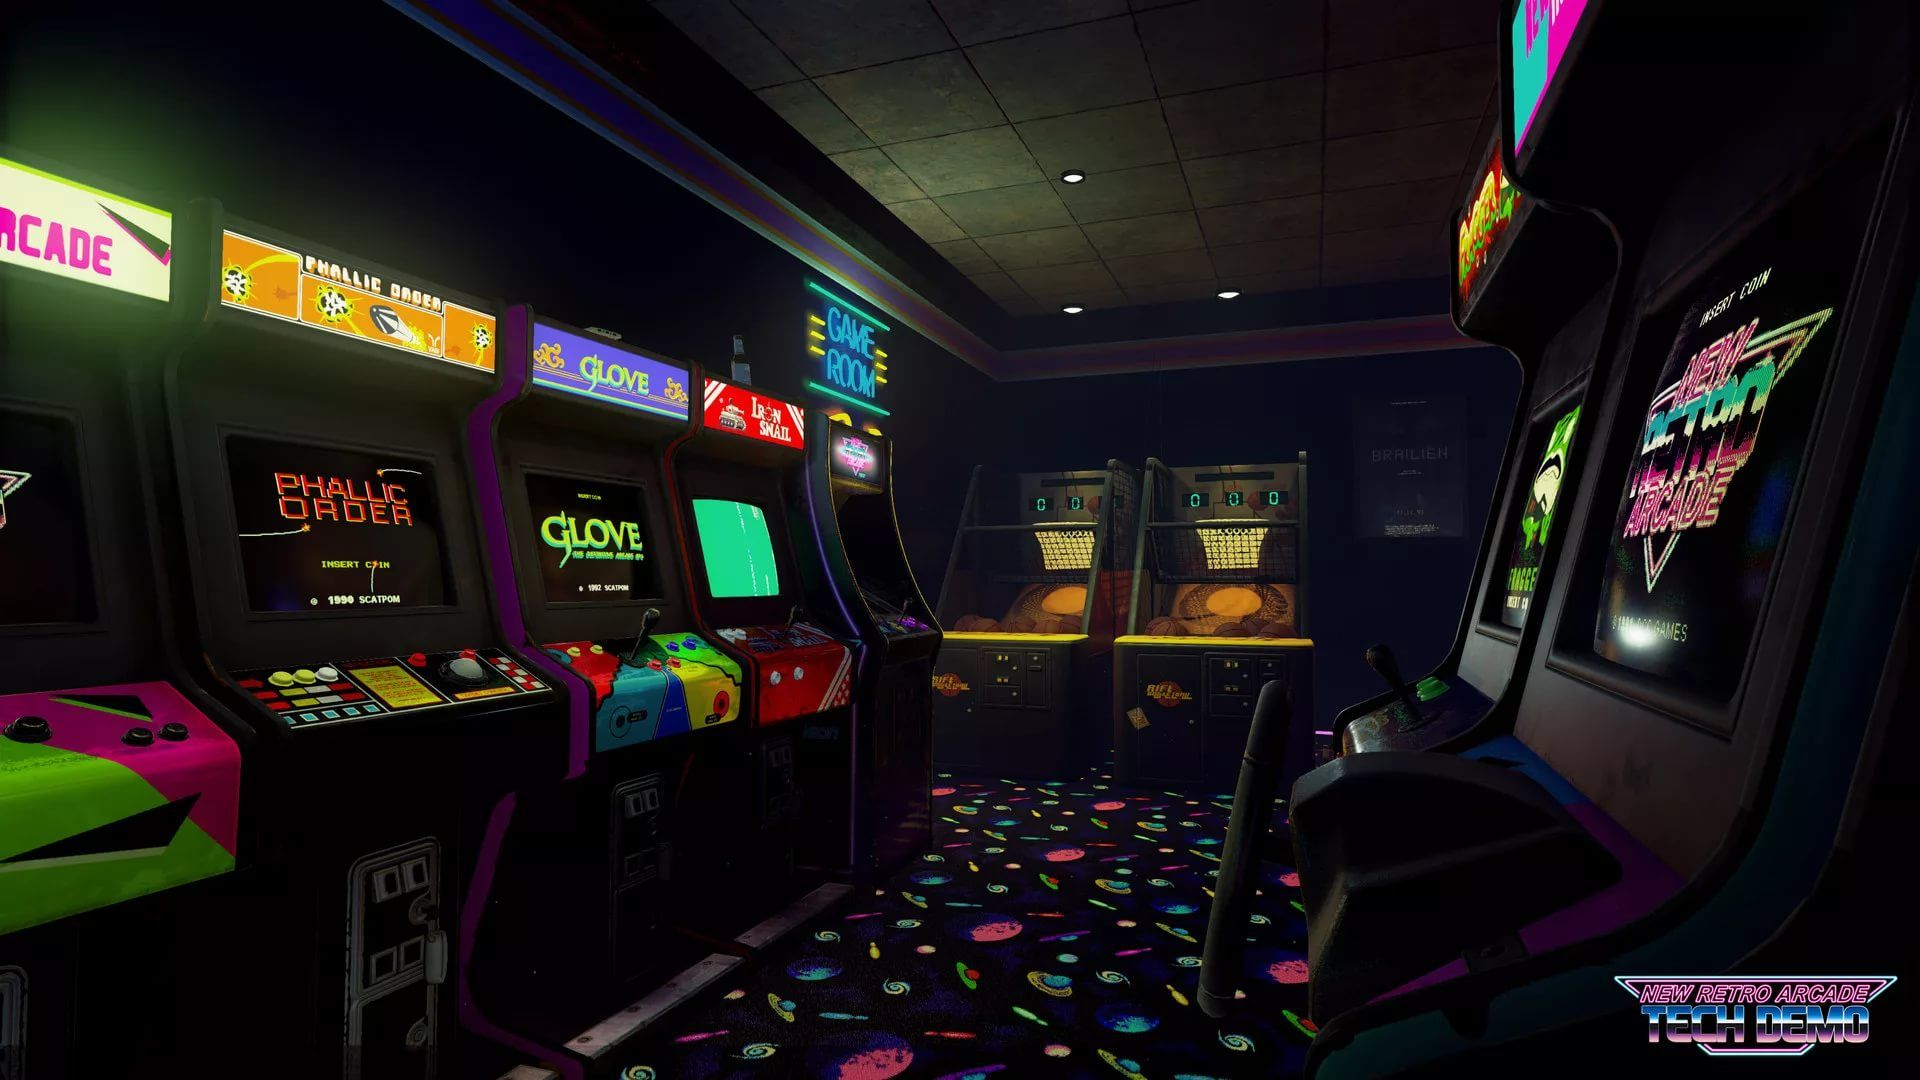 Arcade full screen hd wallpaper